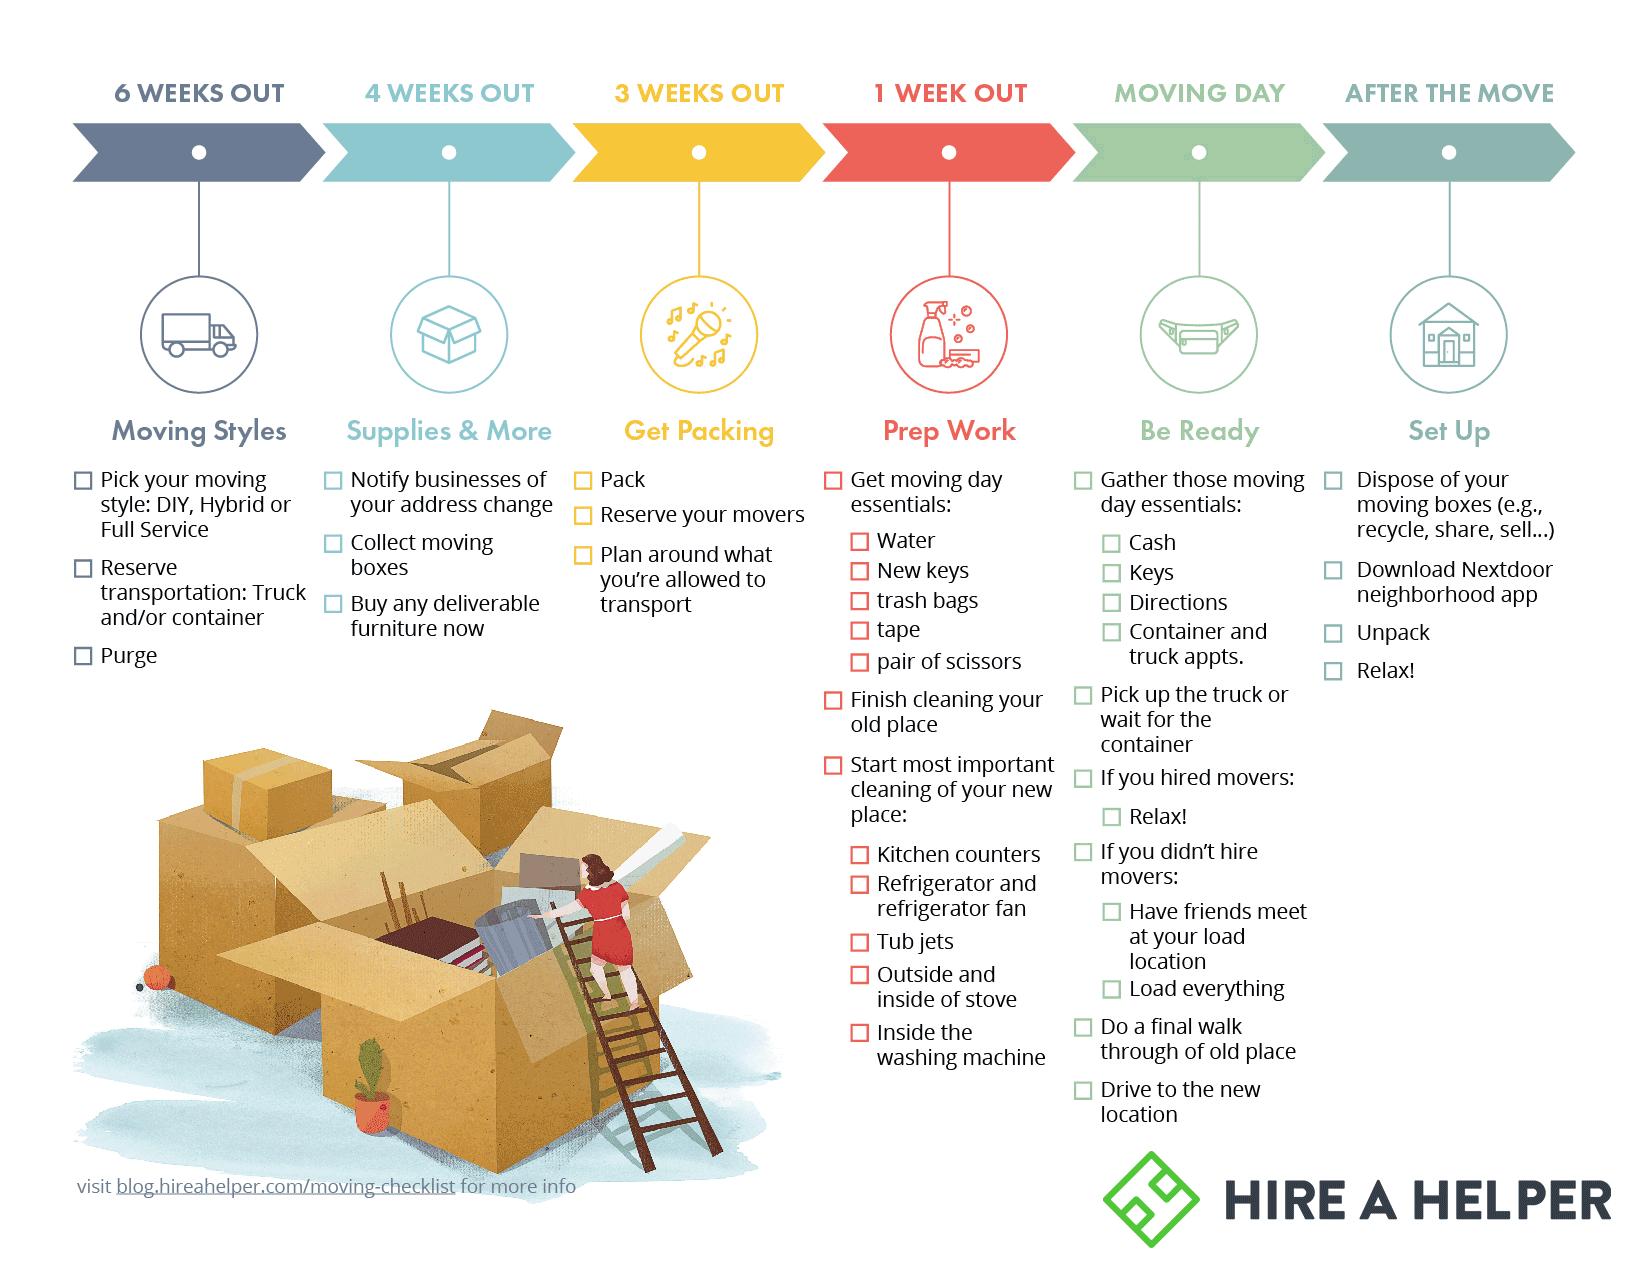 Moving helper app